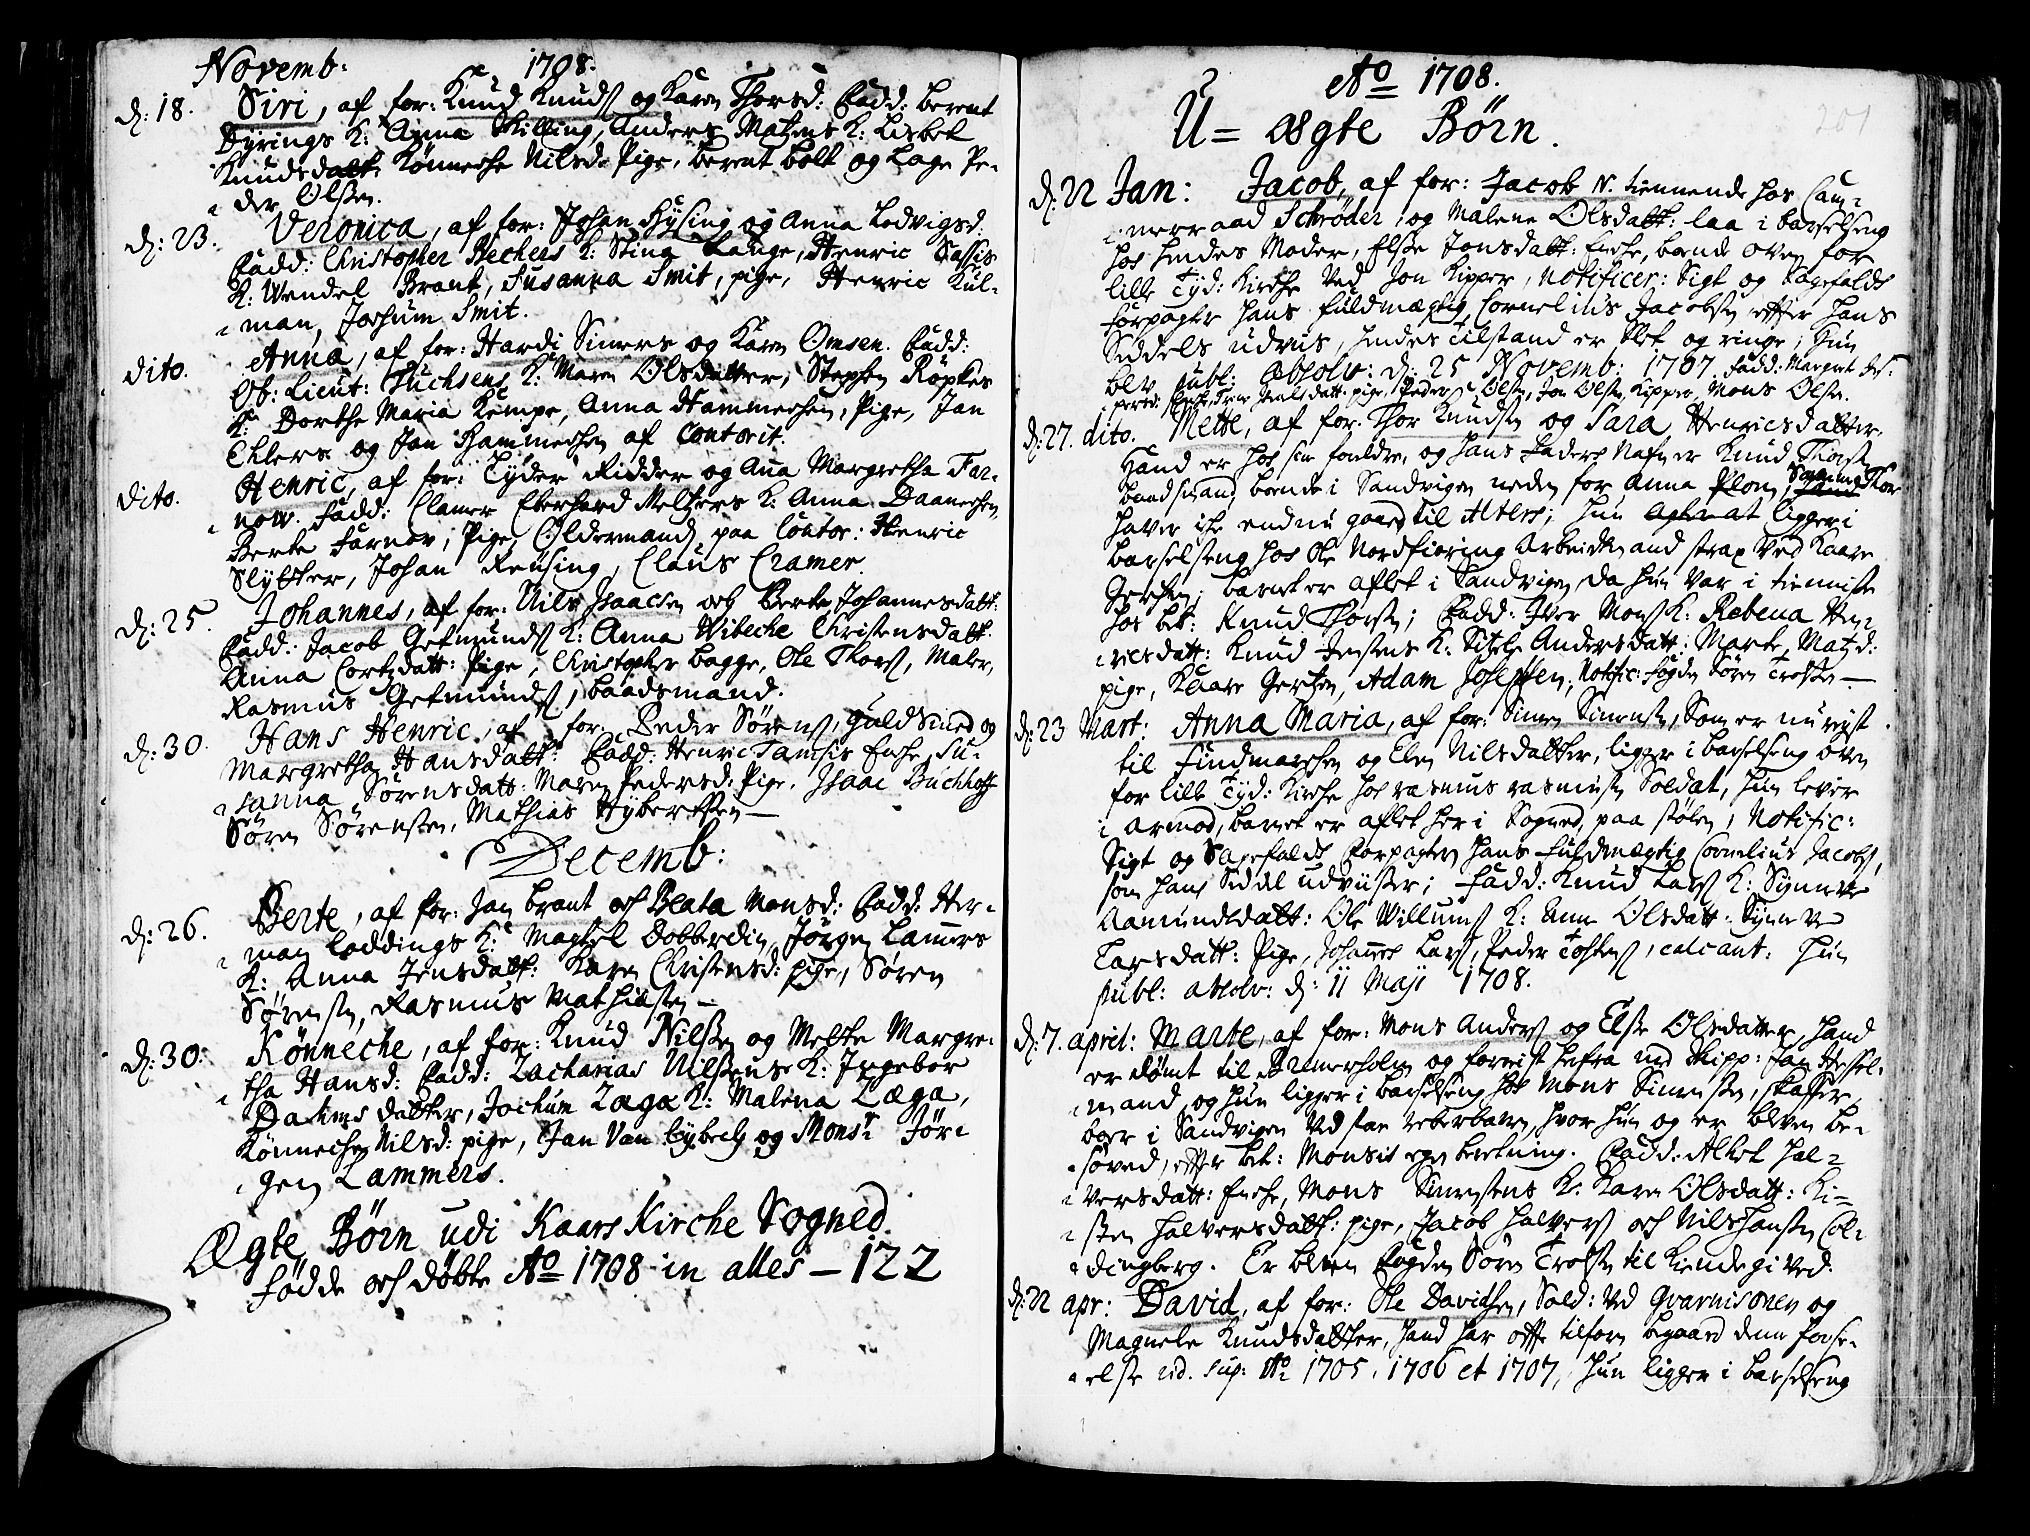 SAB, Korskirken Sokneprestembete, H/Haa/L0003: Ministerialbok nr. A 3, 1698-1719, s. 201